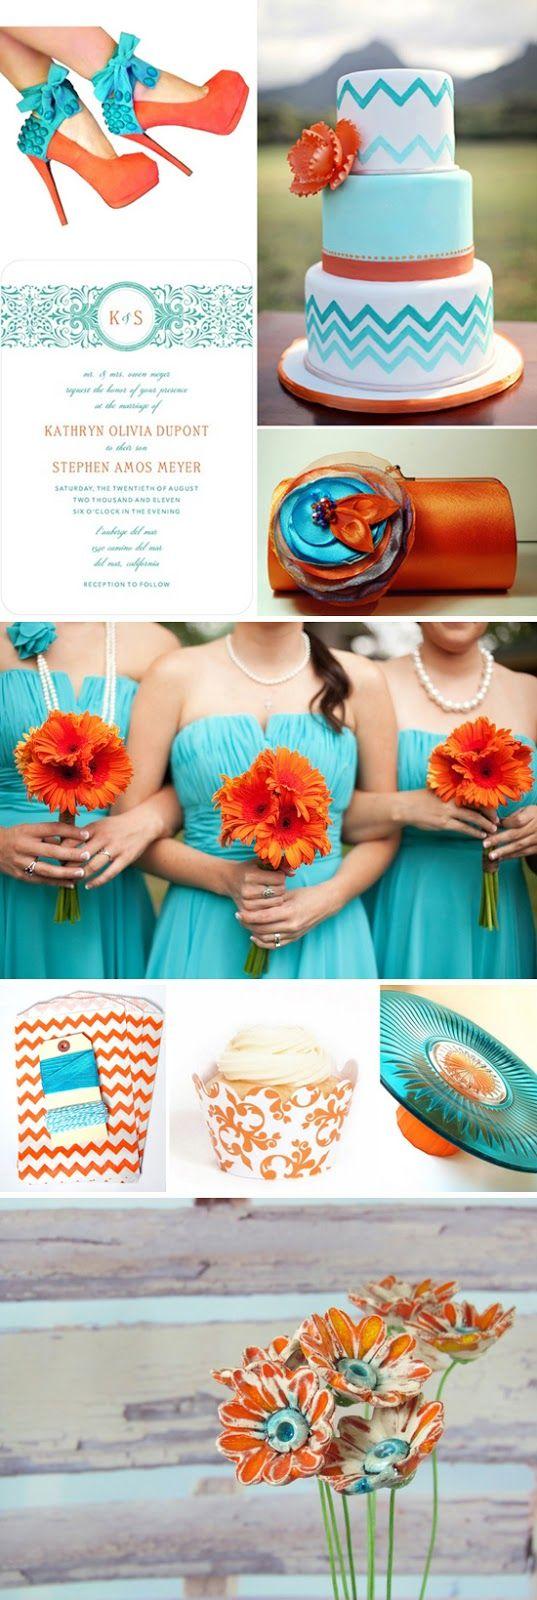 Inspiration Boards Turquoise Orange Savvy Deets Bridal A Wedding Blog